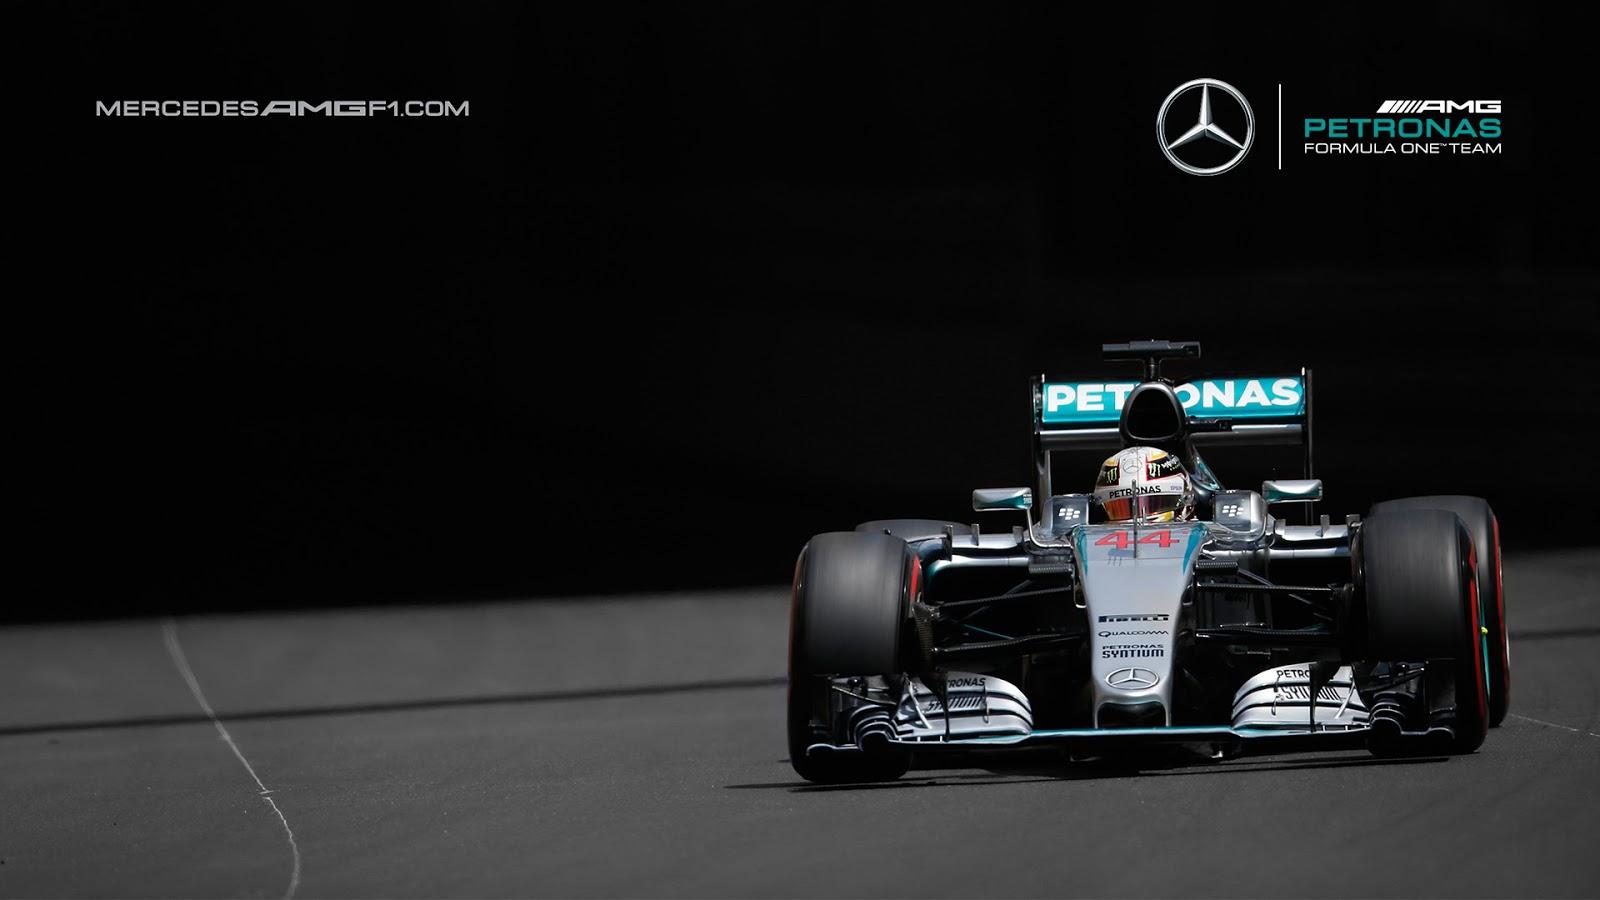 Mercedes amg f1 iphone wallpaper 8